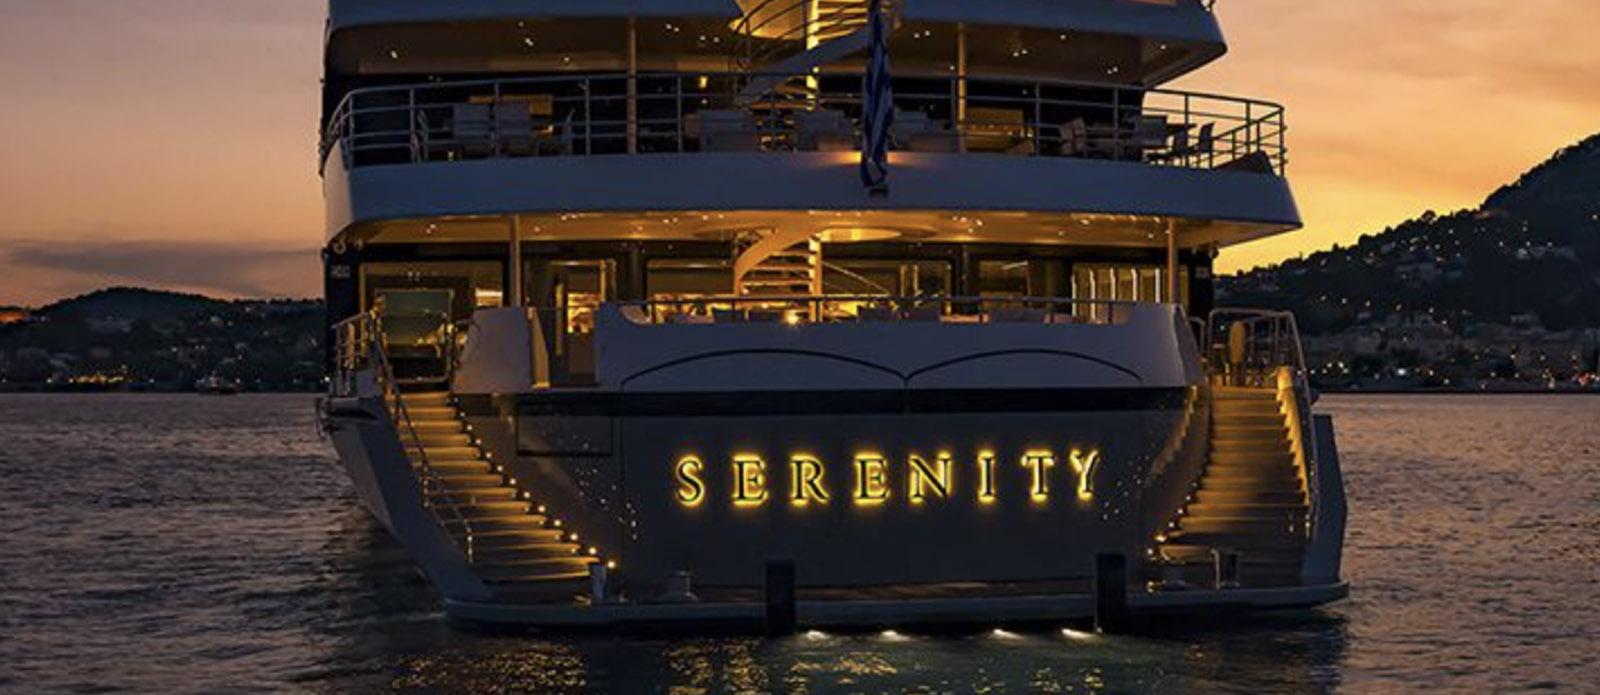 Serenity - Exterior